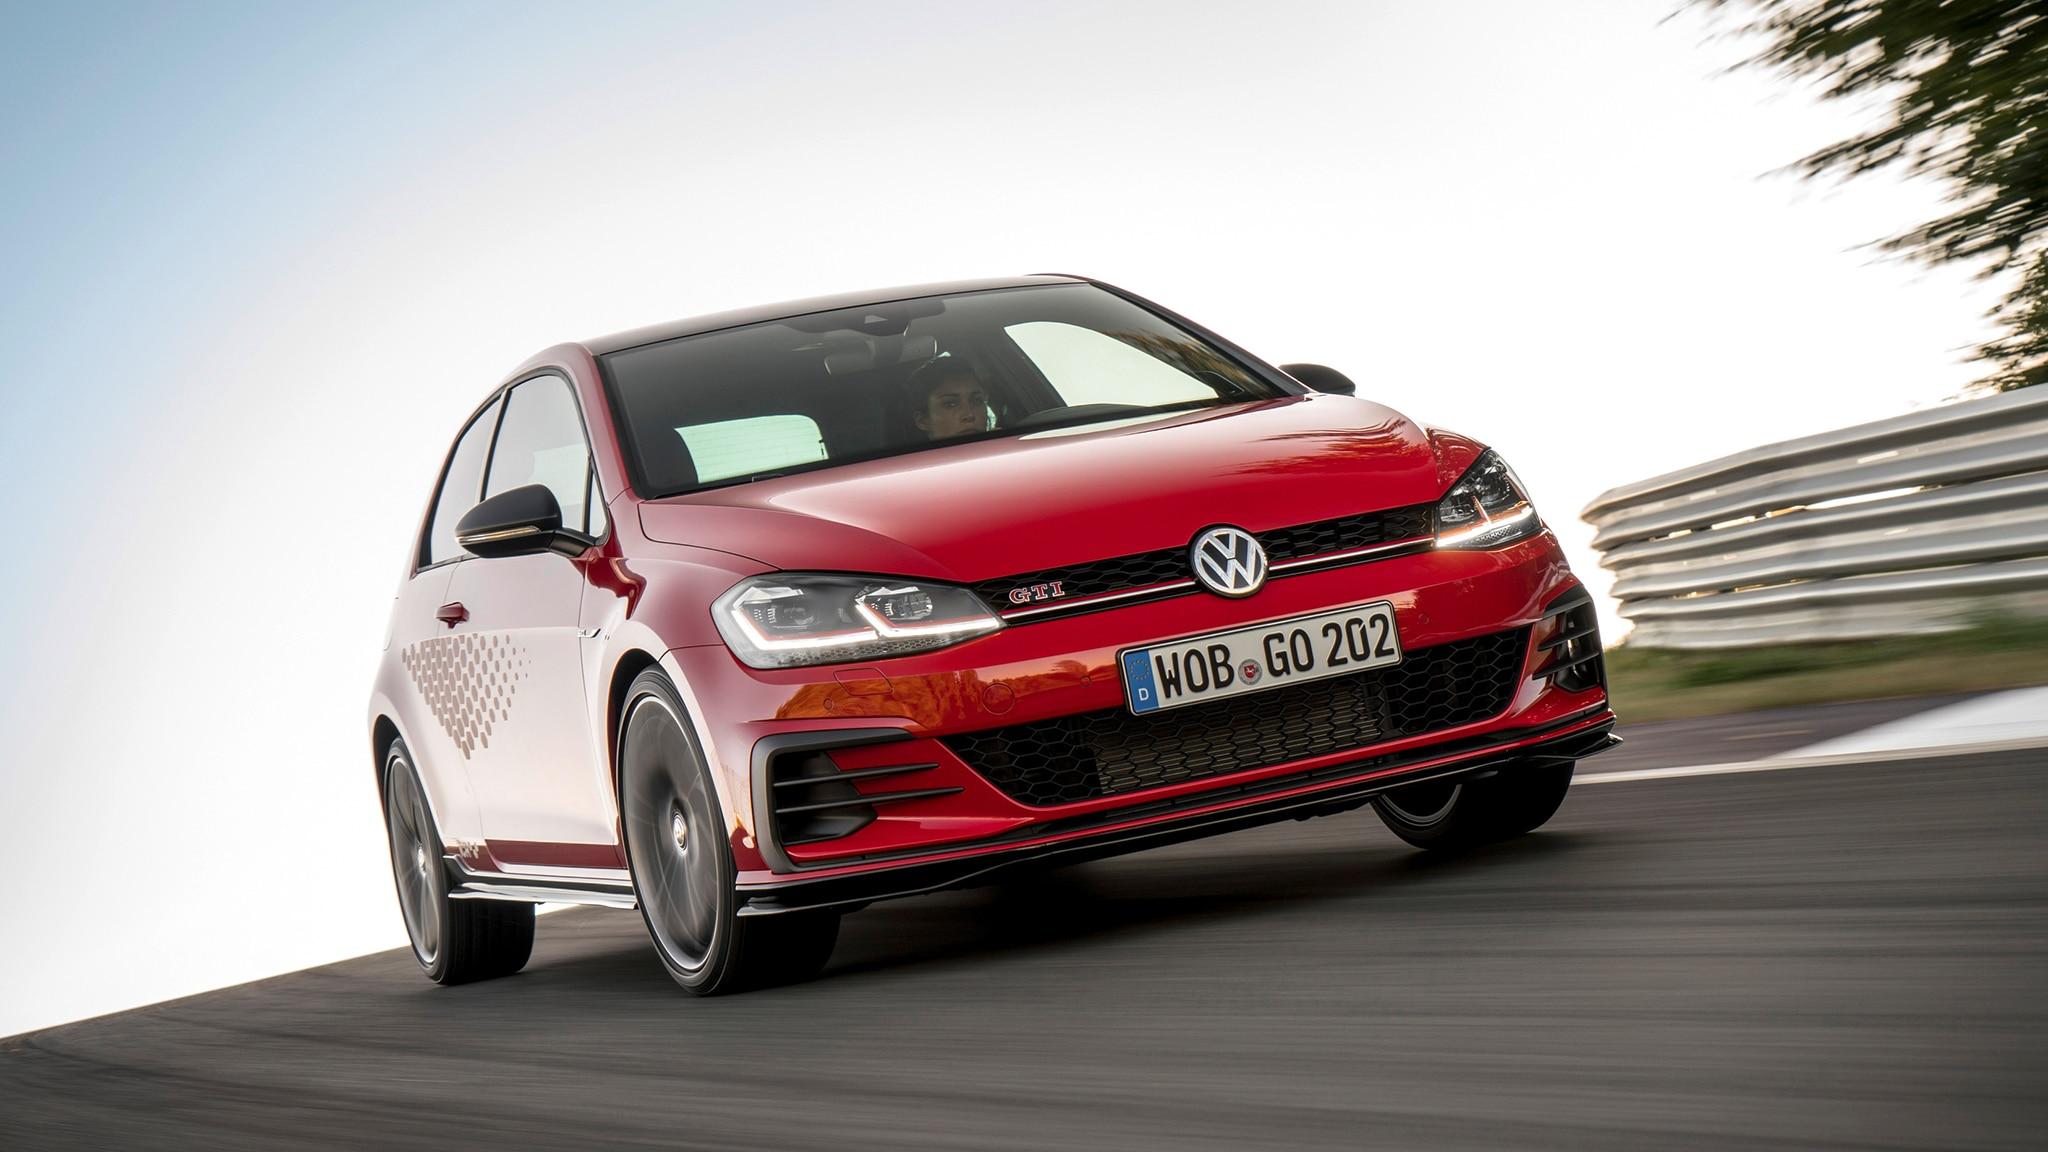 Report: Next-Gen Volkswagen GTI Won't Go Hybrid